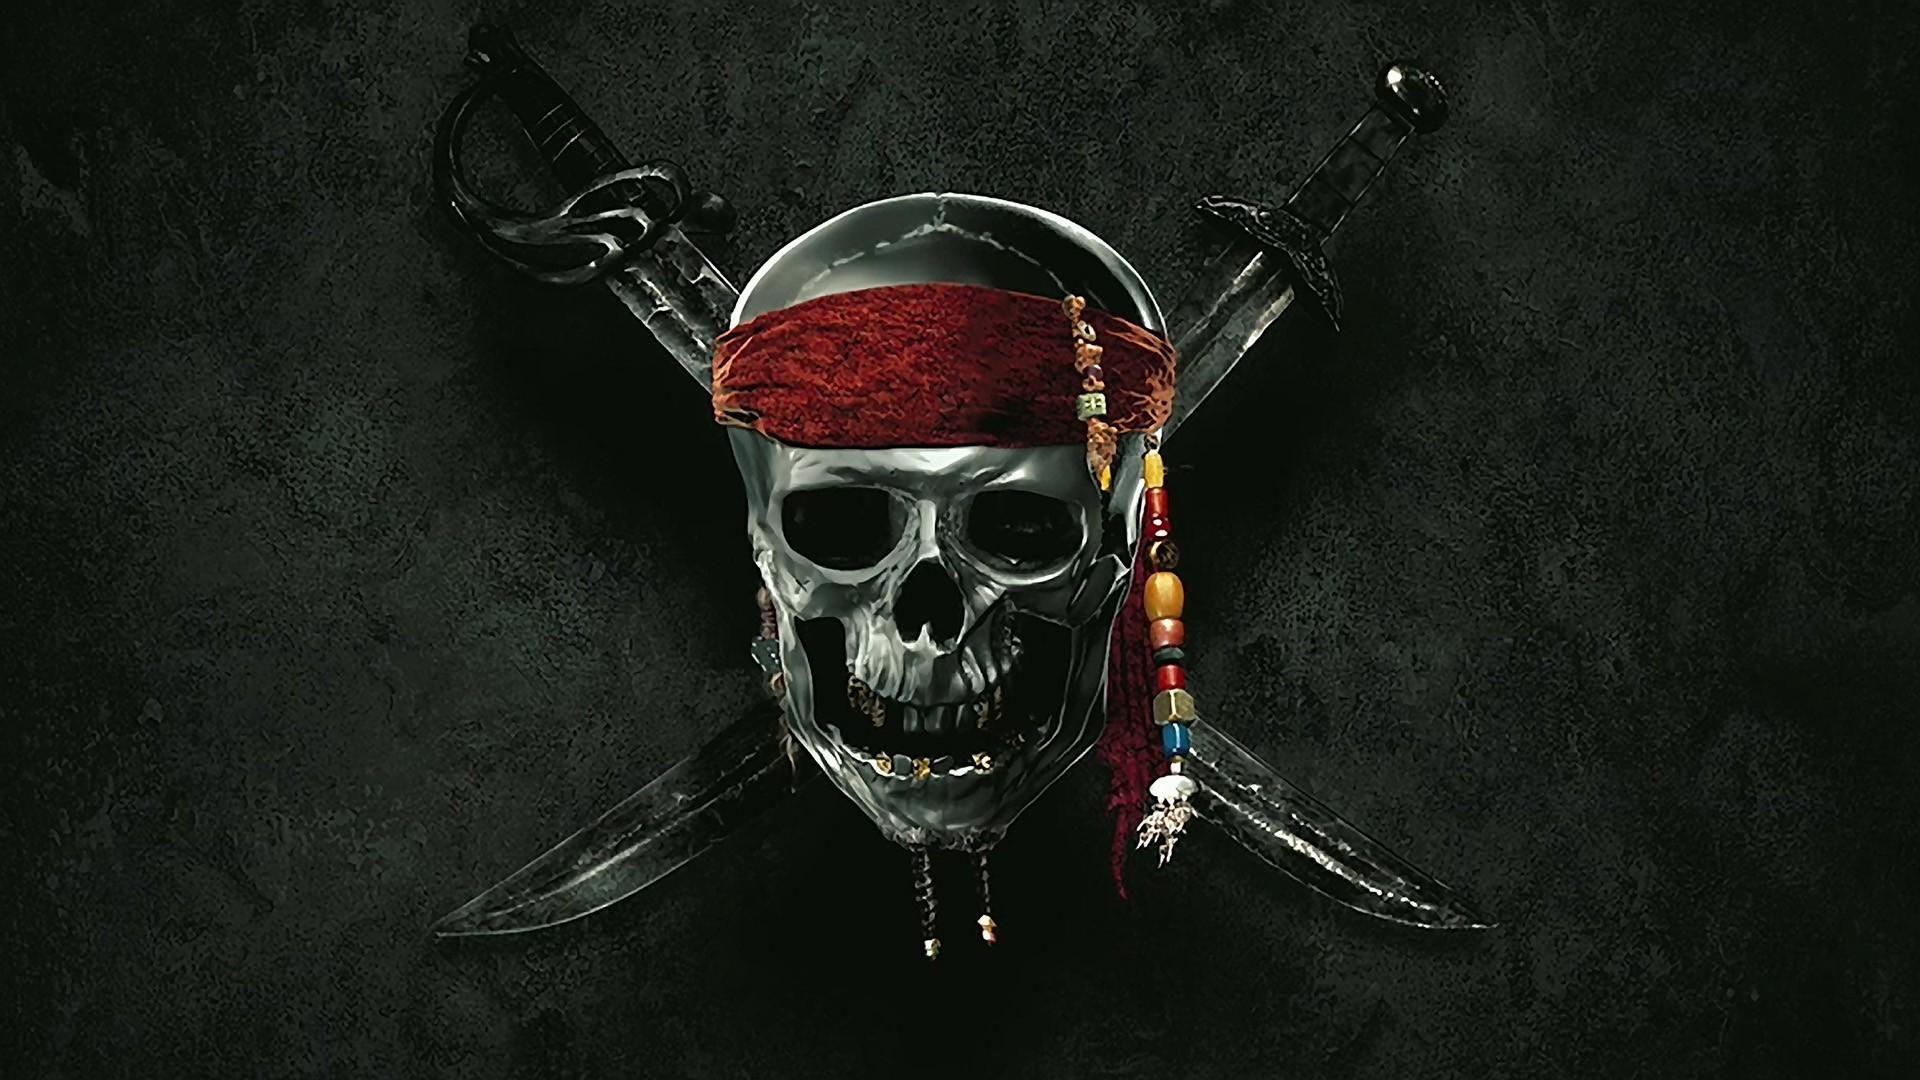 Death skull wallpaper, HD Desktop Wallpapers 2560×1440